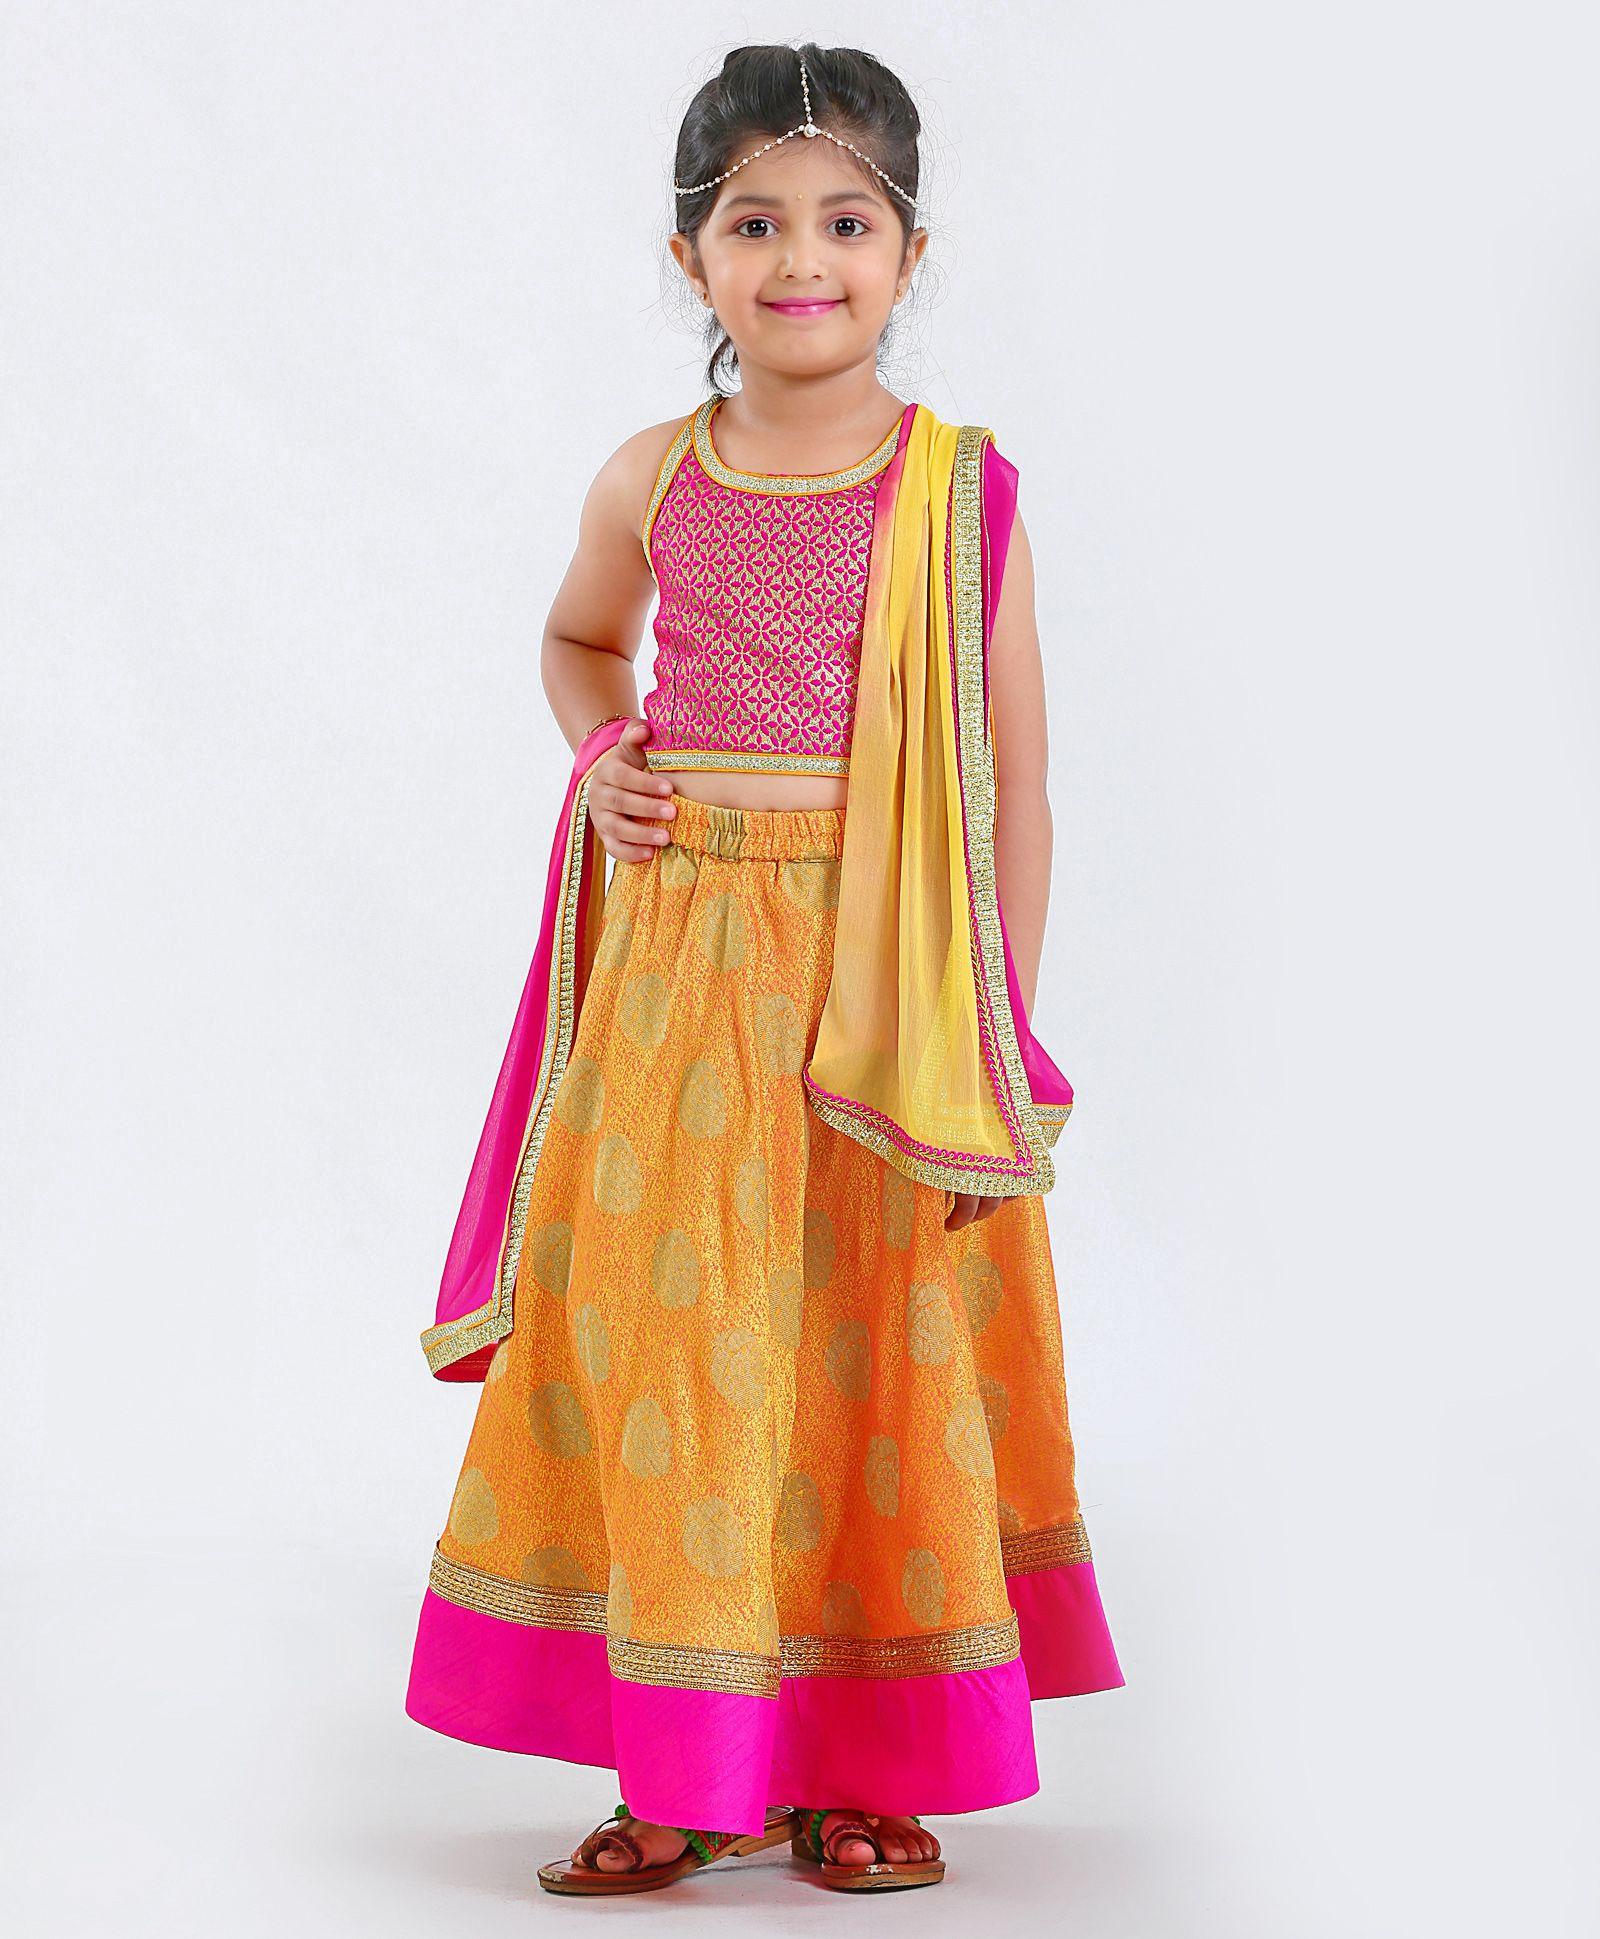 b22c452f942 Kids Chakra Sleeveless Choli With Dupatta   Lehenga Set - Pink   Orange. 2  to 3 Years ...